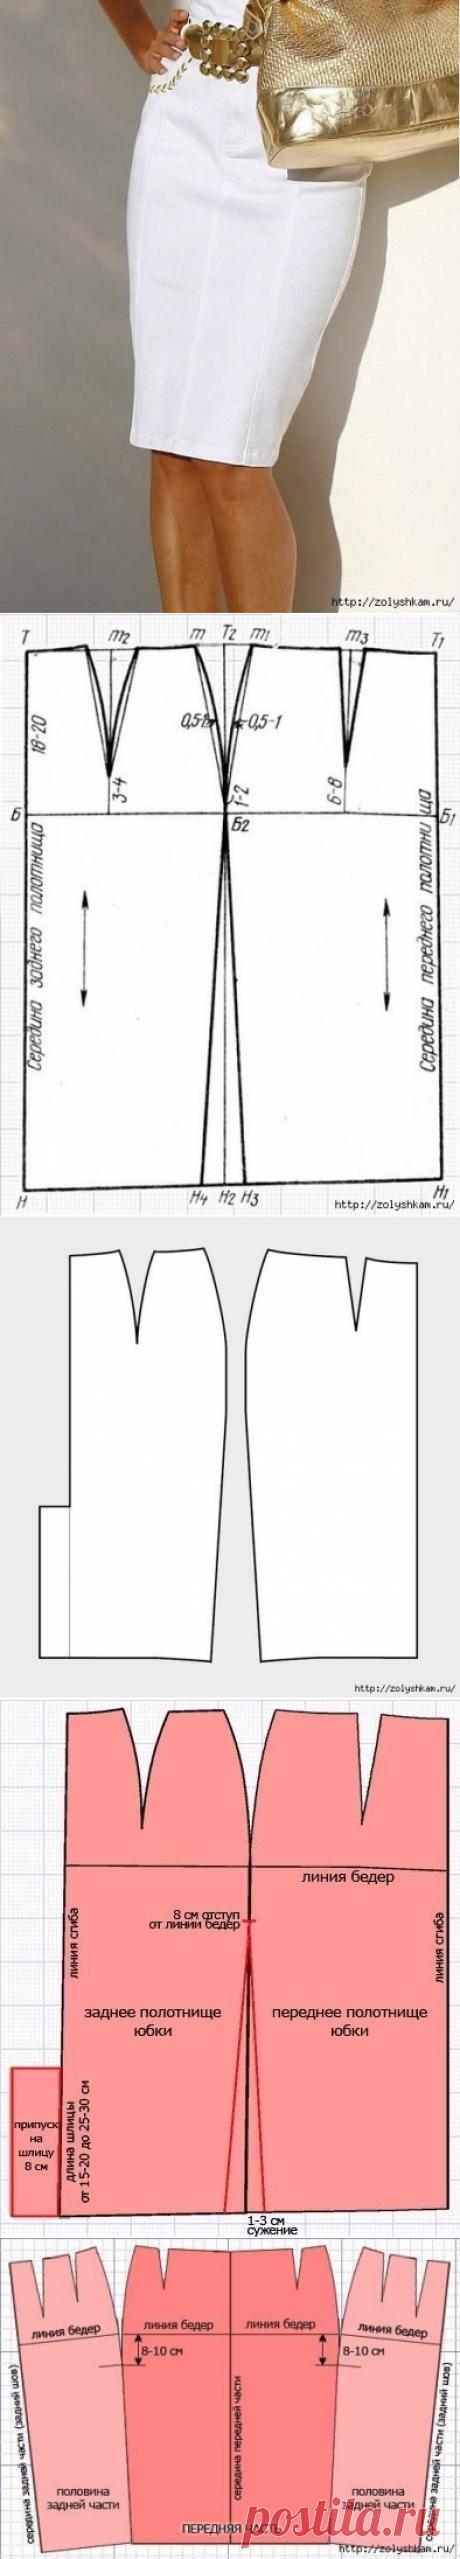 Юбка-карандаш без боковых швов